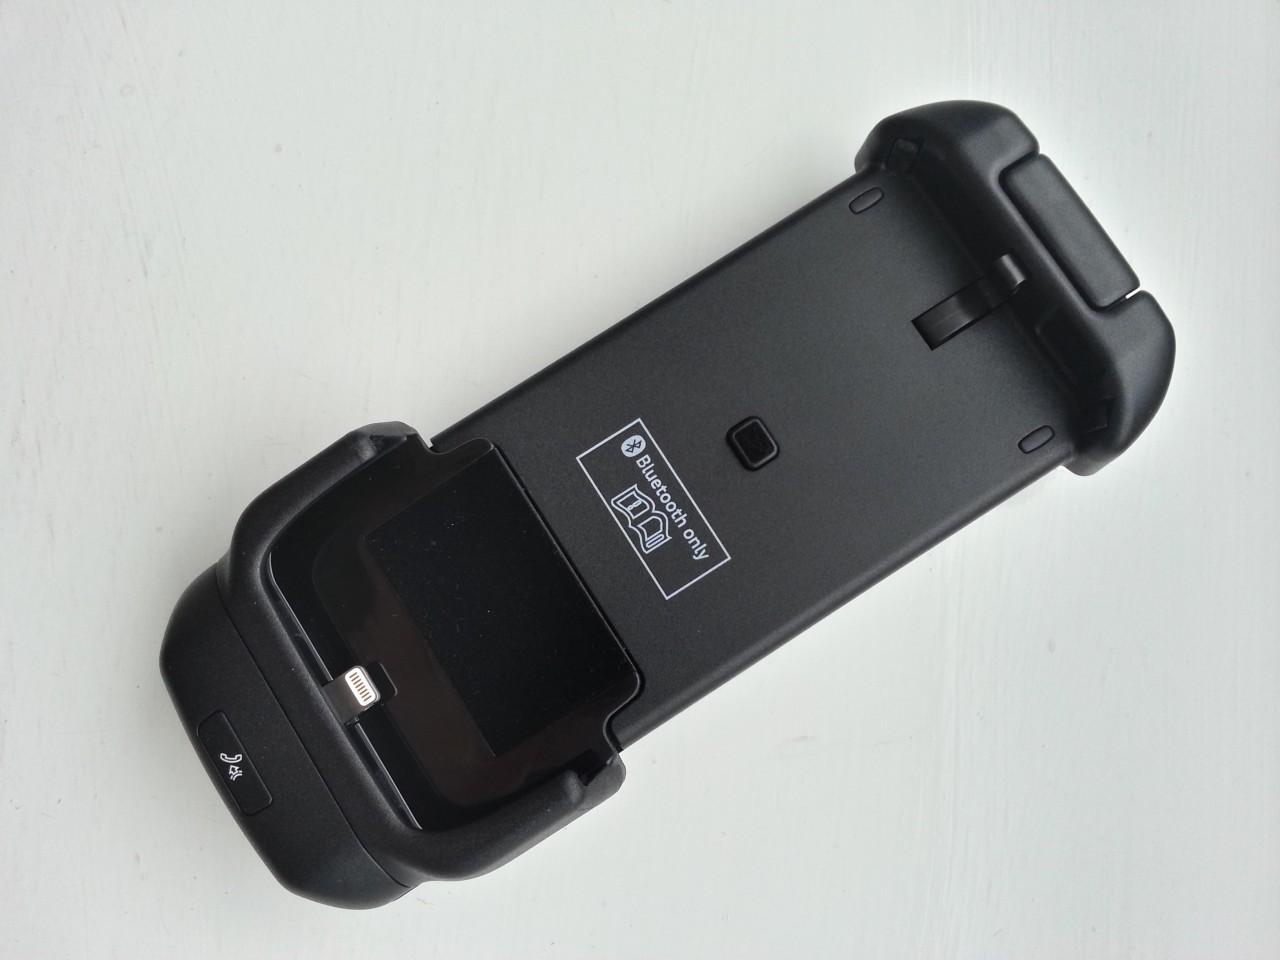 Uchwyt Na Telefon W Podłokietniku Audi A4 B8 Audi A4